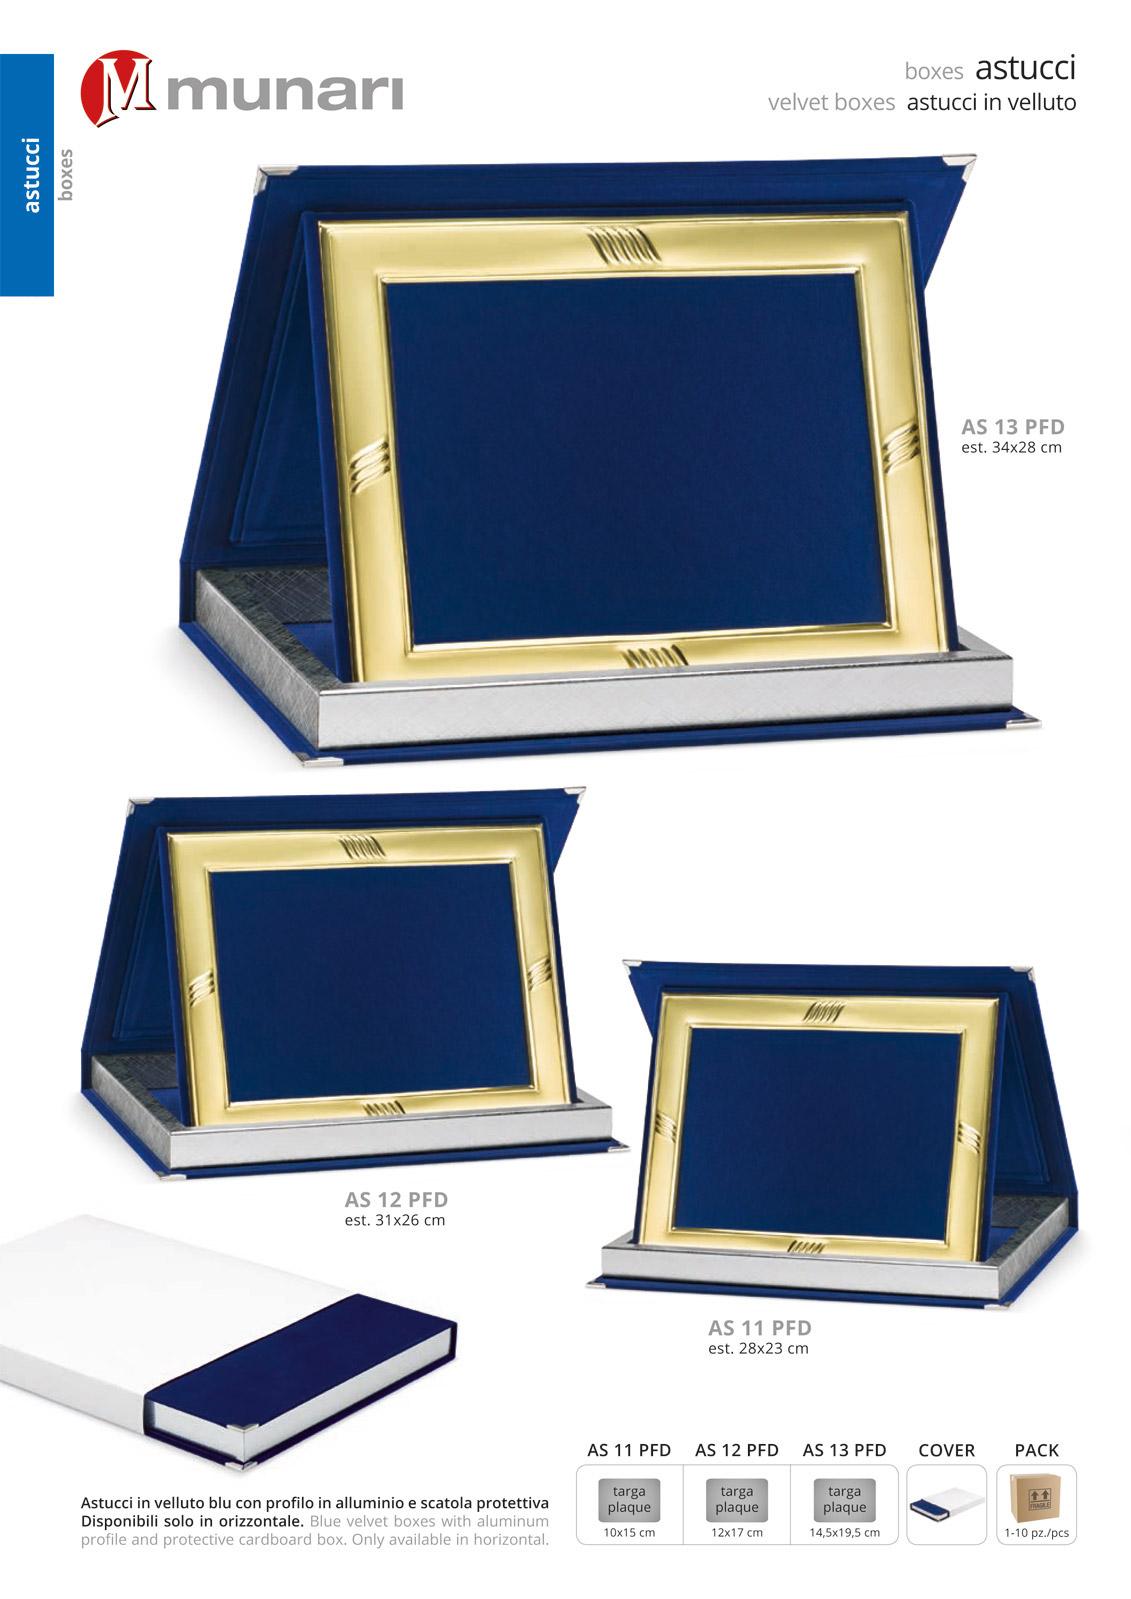 Blue velvet boxes series AS 10PFD with aluminum profile